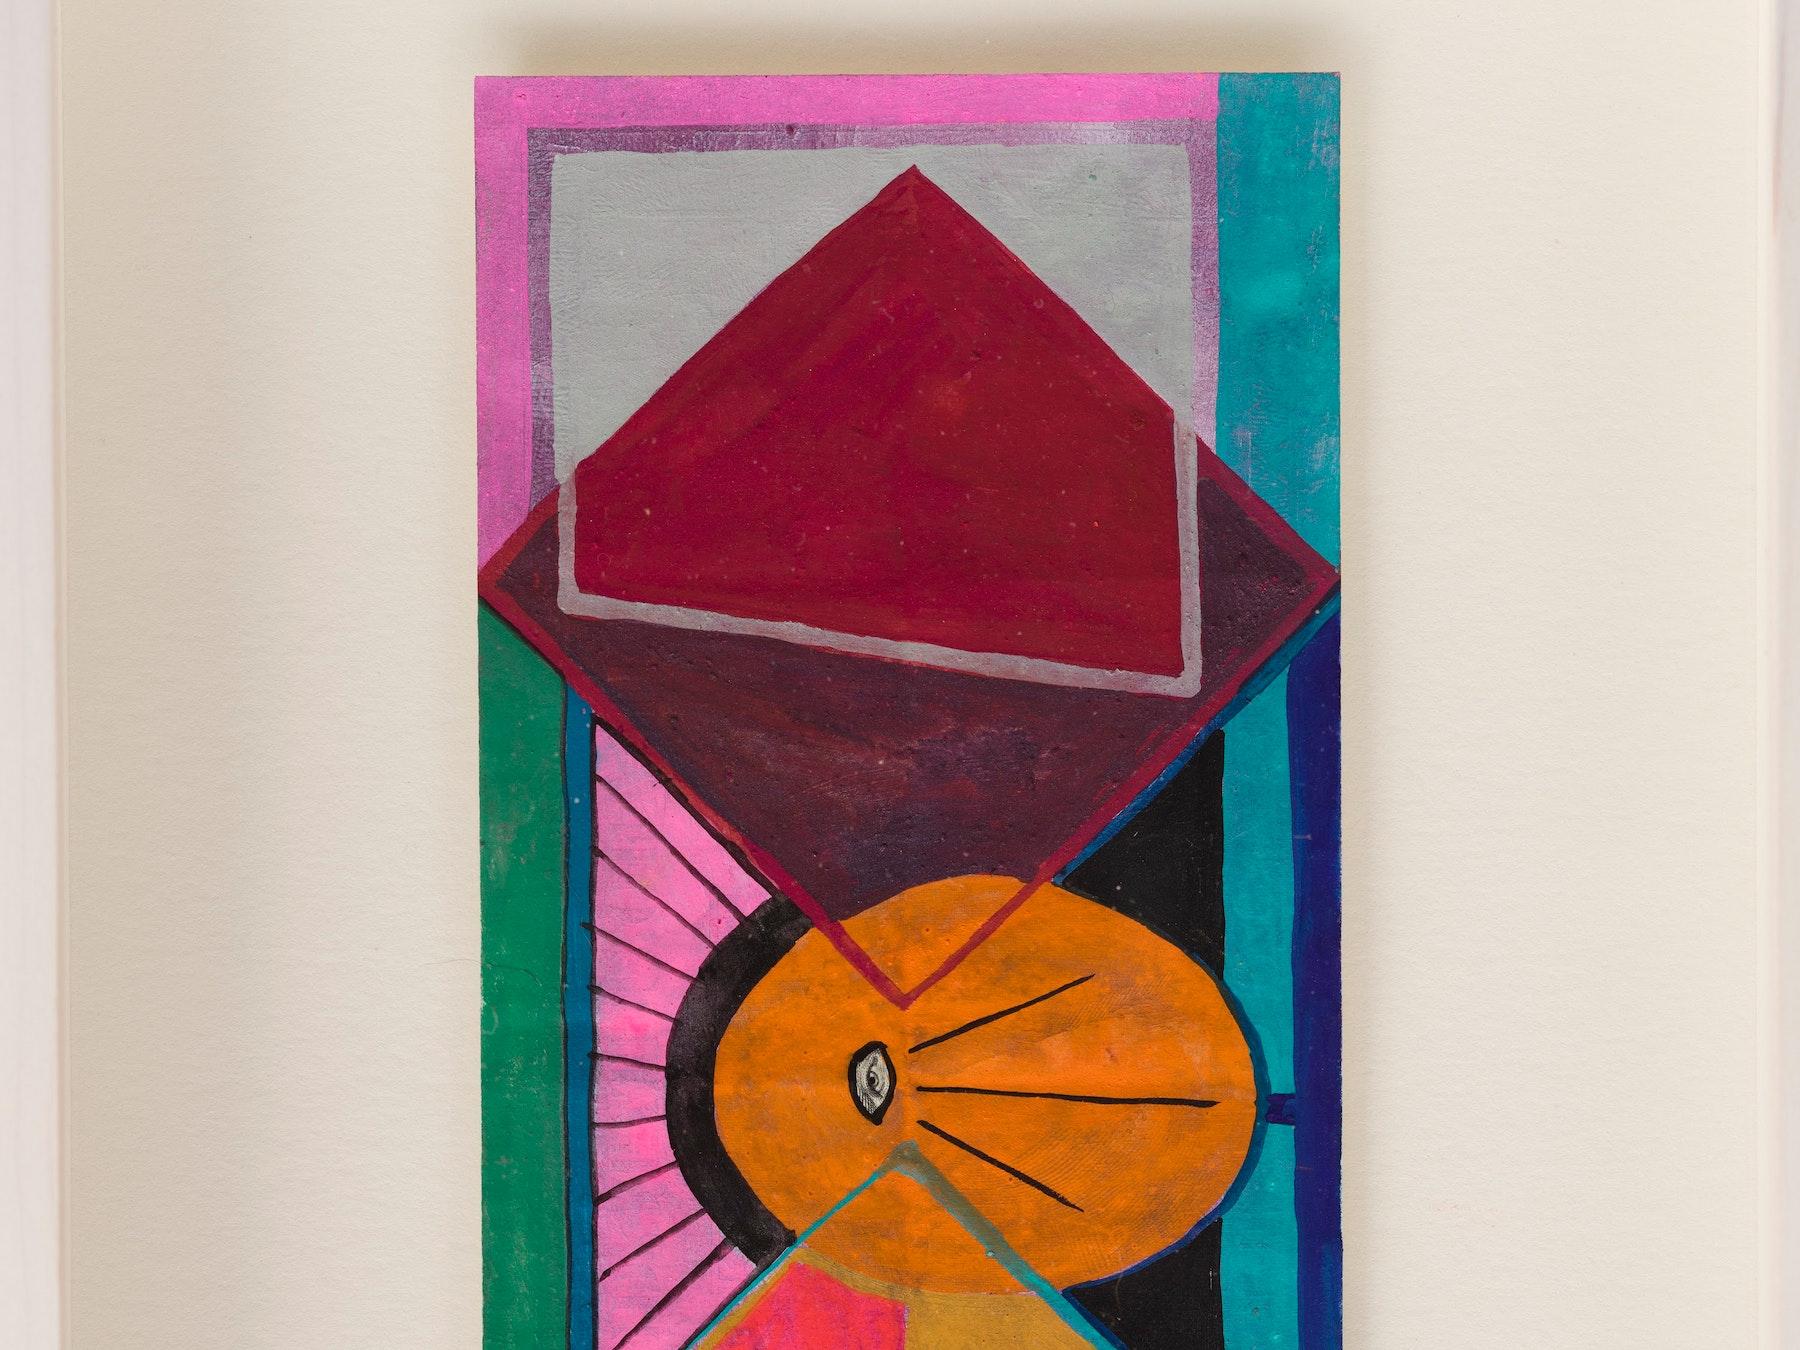 "Sarah Cain ""$ talisman,"" 2021 Acrylic on dollar bill 9 ¹⁄₂"" x 6 ¹⁄₄"" x 1 ³⁄₄"" [HxWxD] (24.13 x 15.85 x 4.45 cm) Inventory #CAS159 Courtesy of the artist and Vielmetter Los Angeles Photo credit: Evan Bedford"